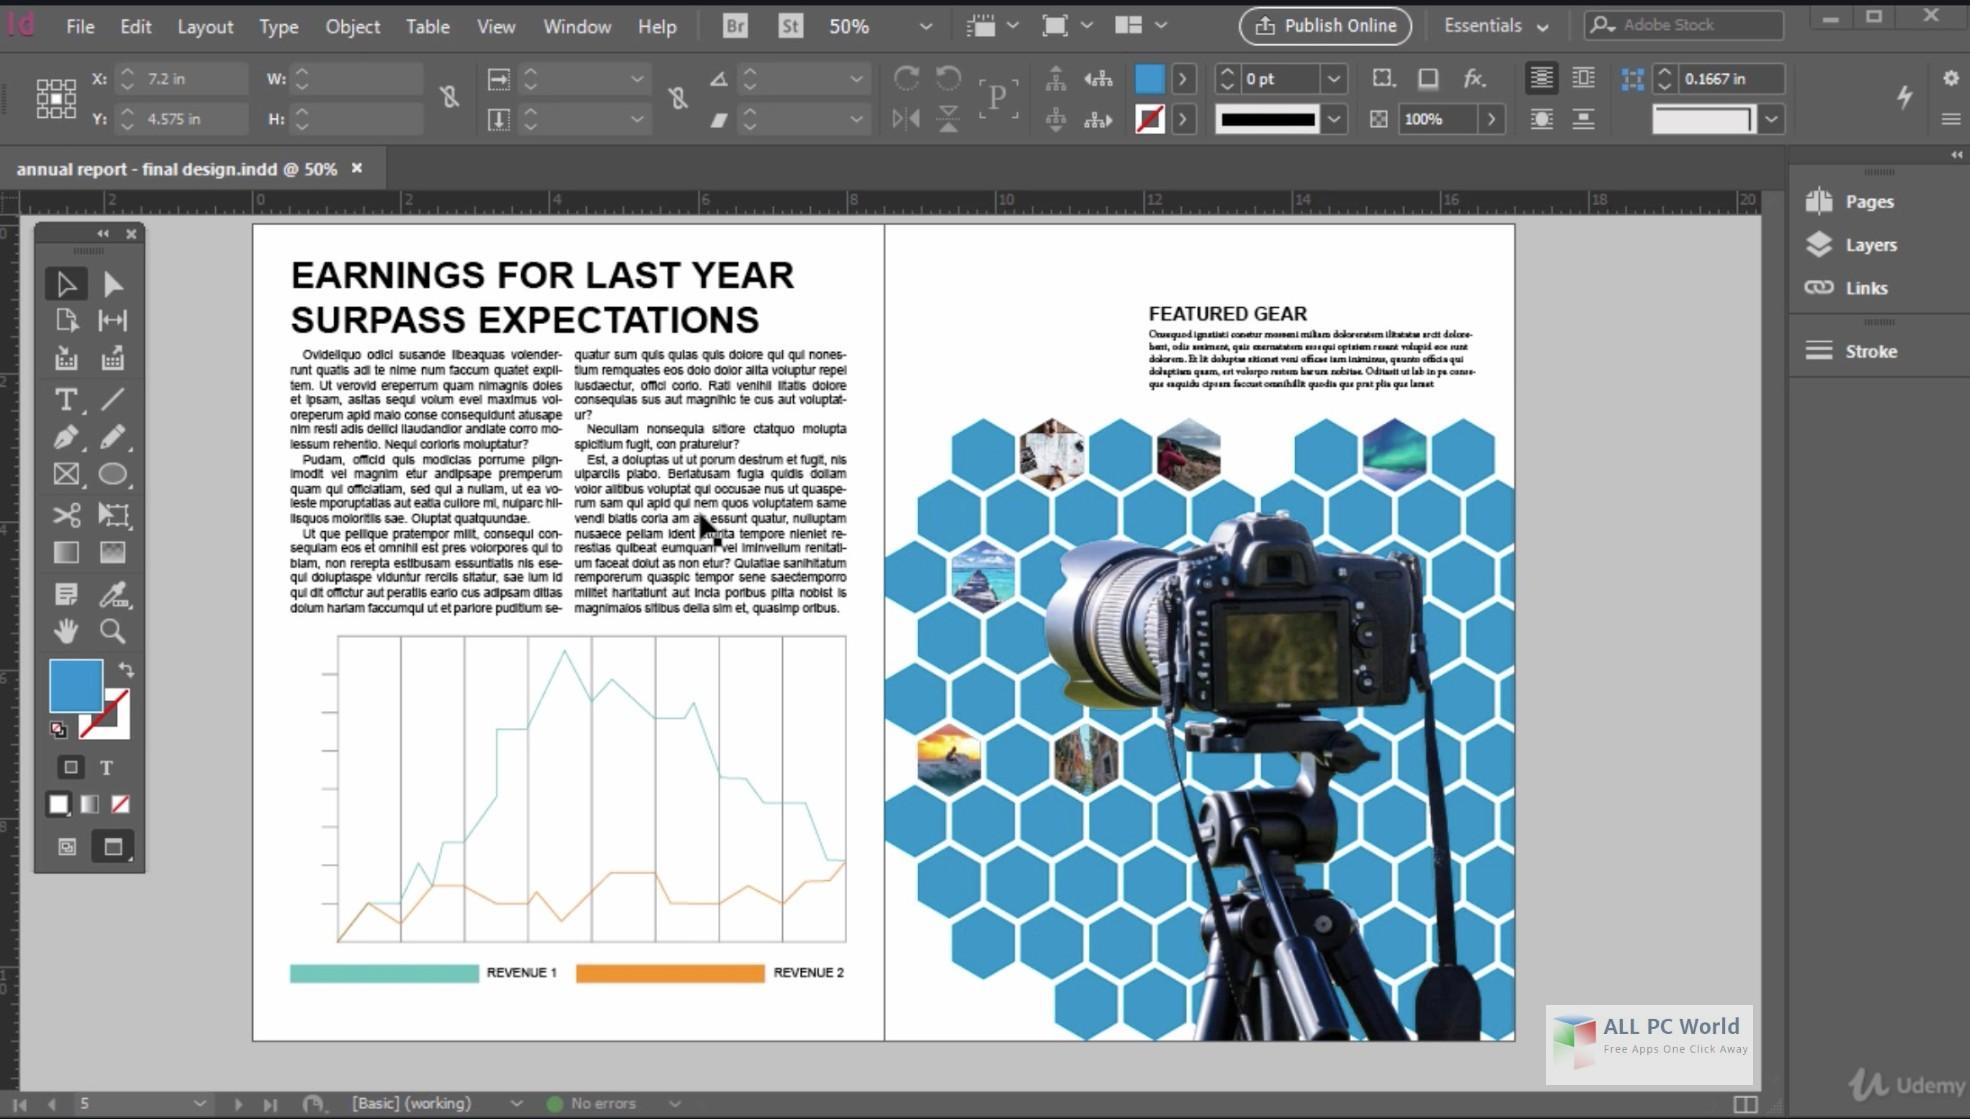 Adobe InDesign CC 2018 v14.0